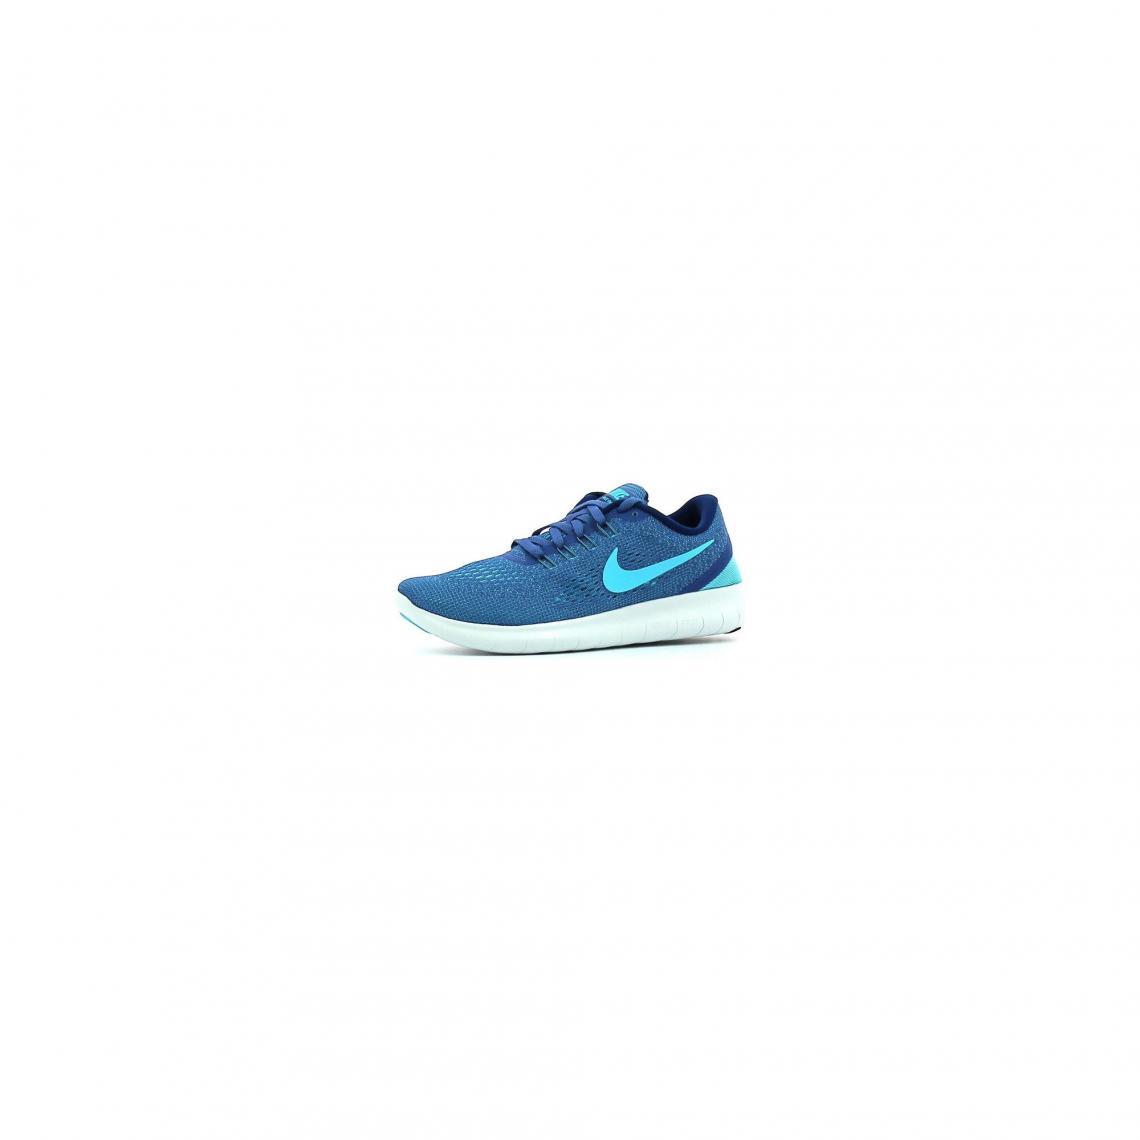 Nike Free Run 2 chaussures de sport femme Turquoise 1 avis 45